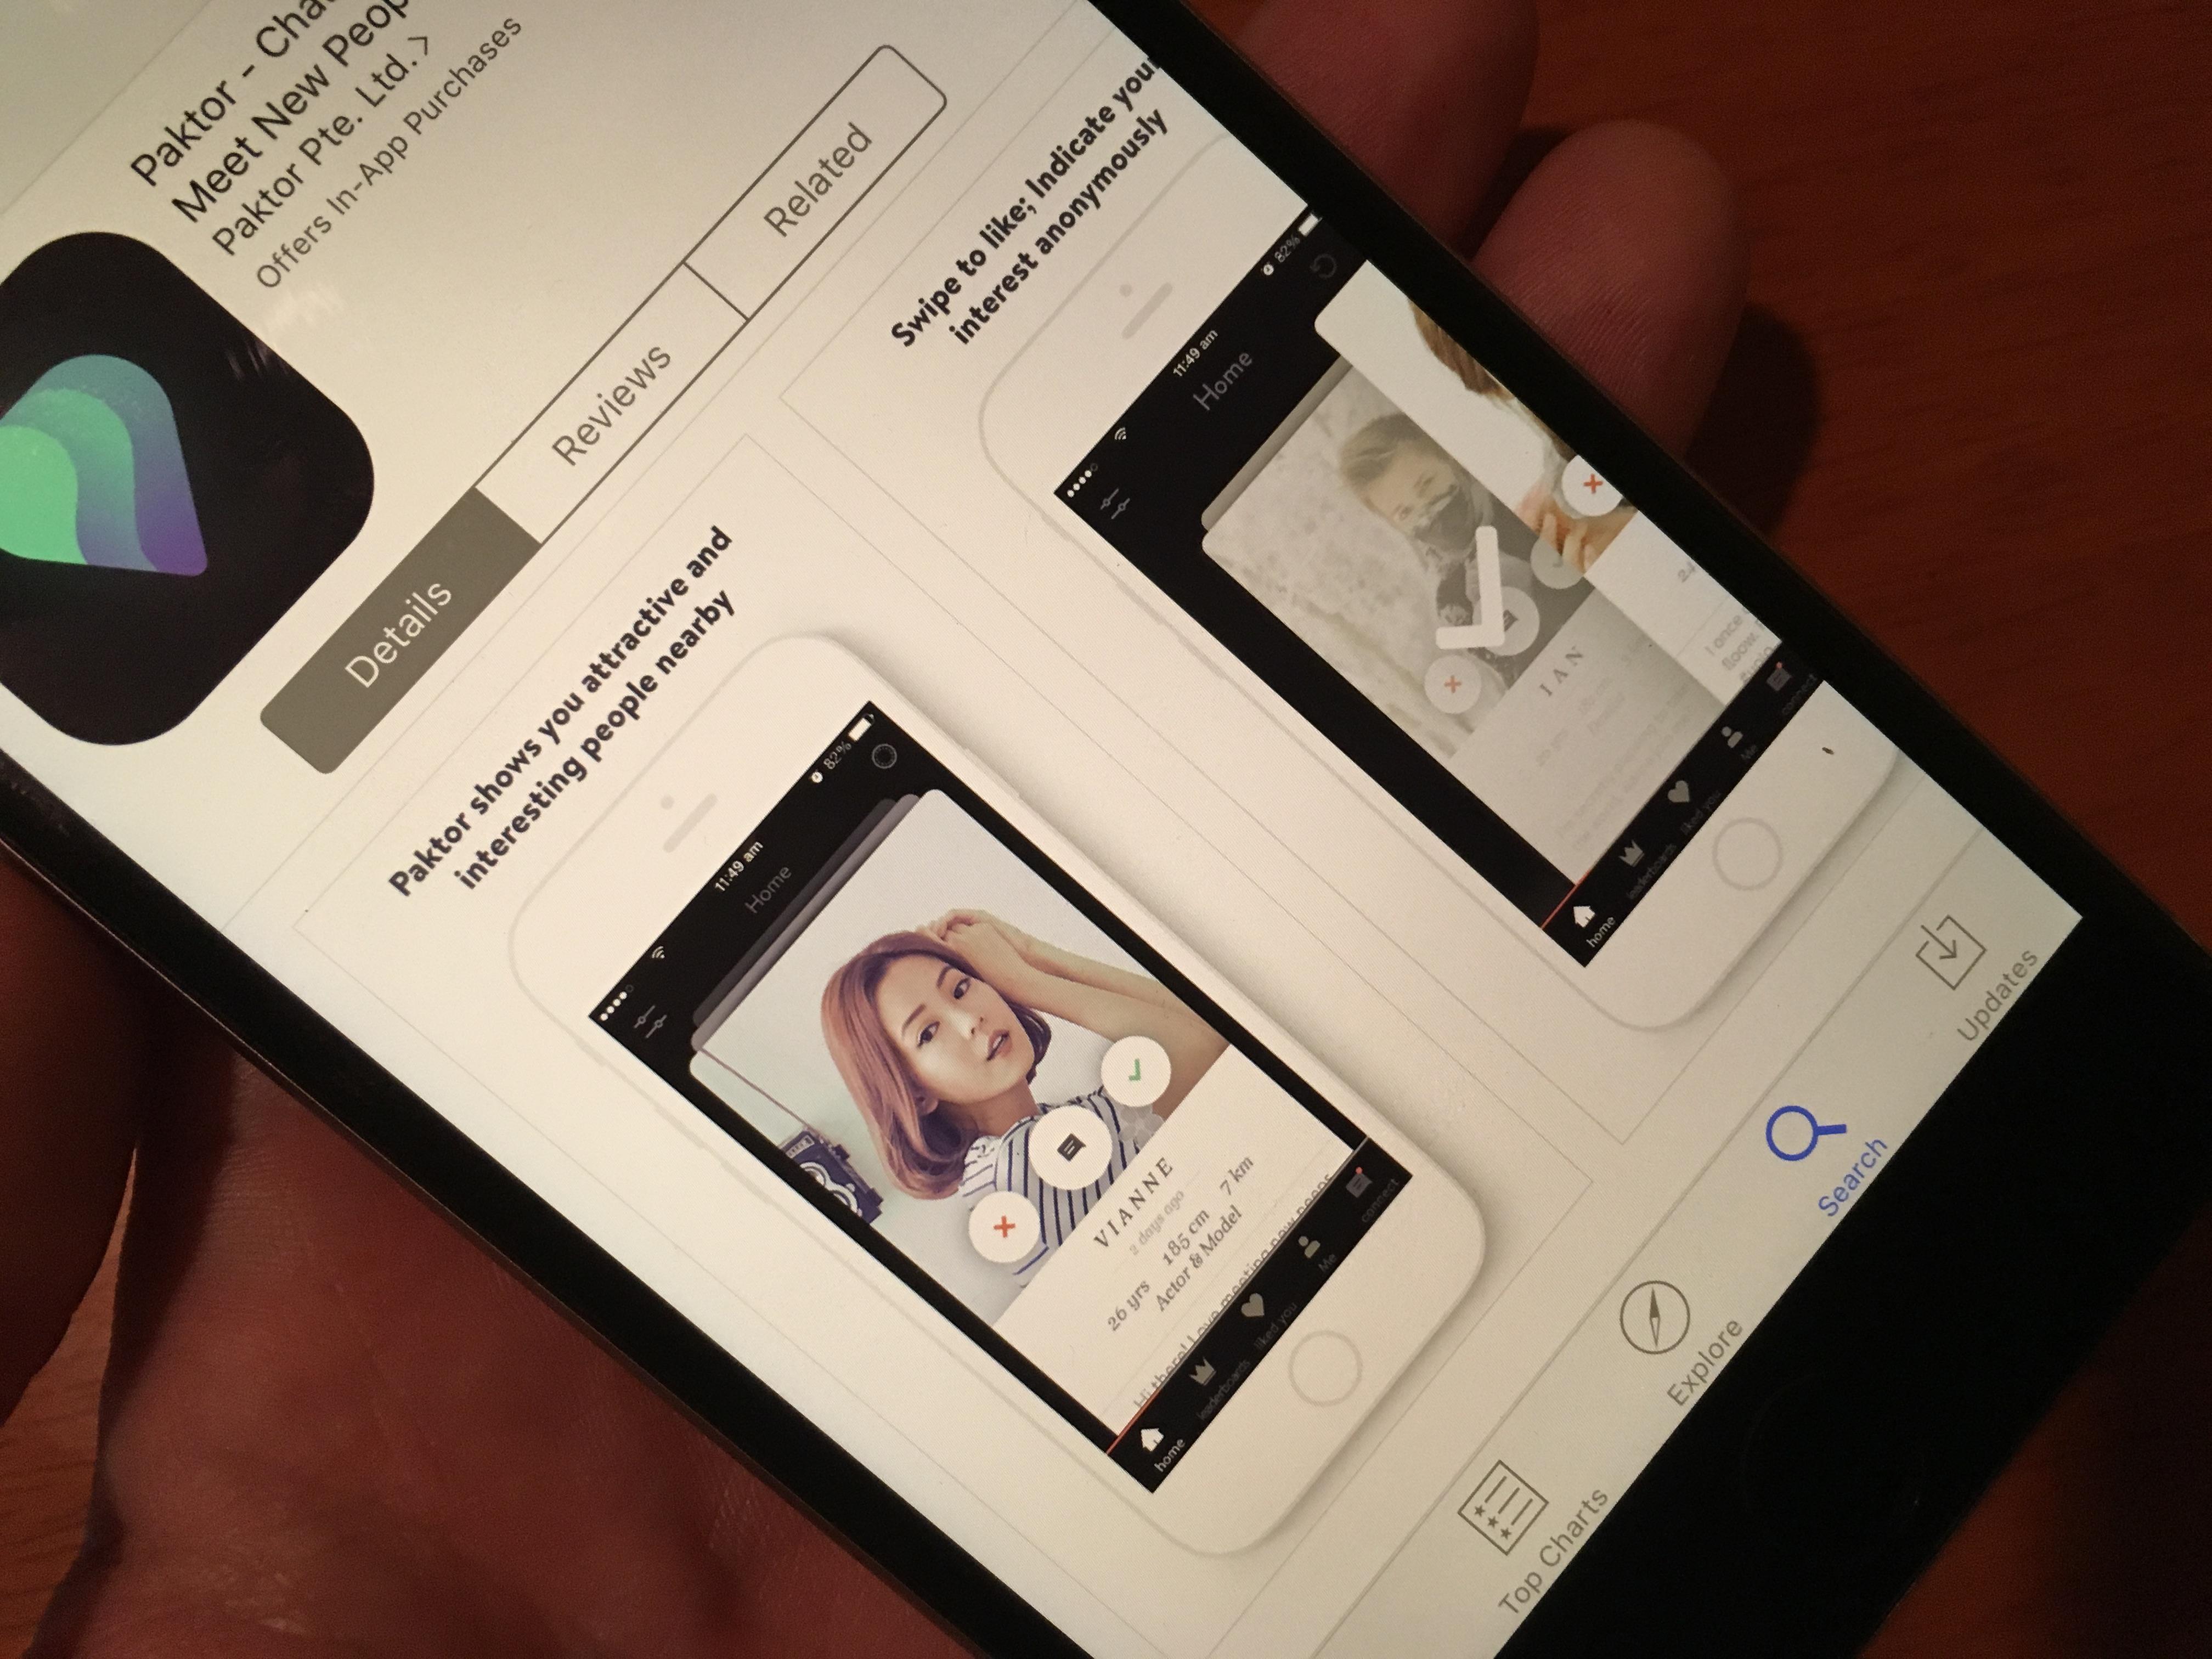 paktor designing a dating app